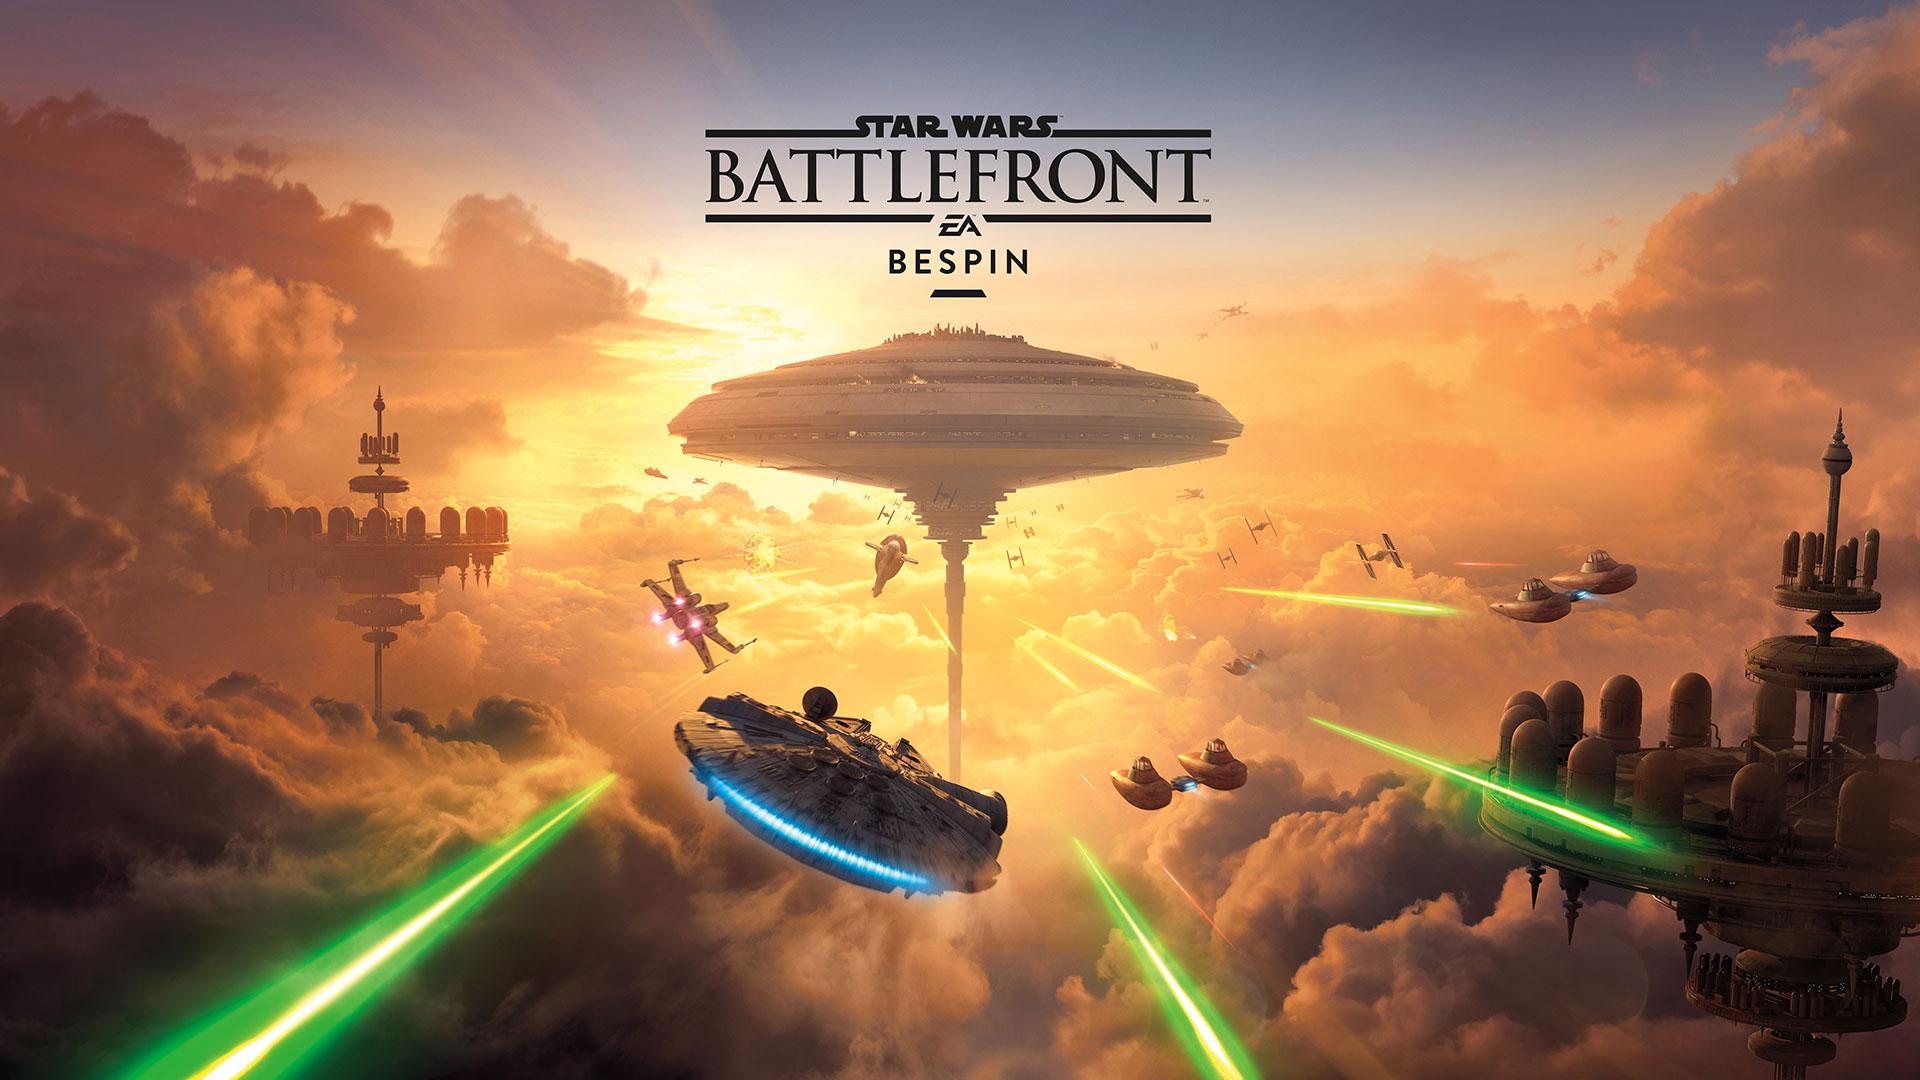 'Star Wars Battlefront' Bespin DLC Gets Release Date